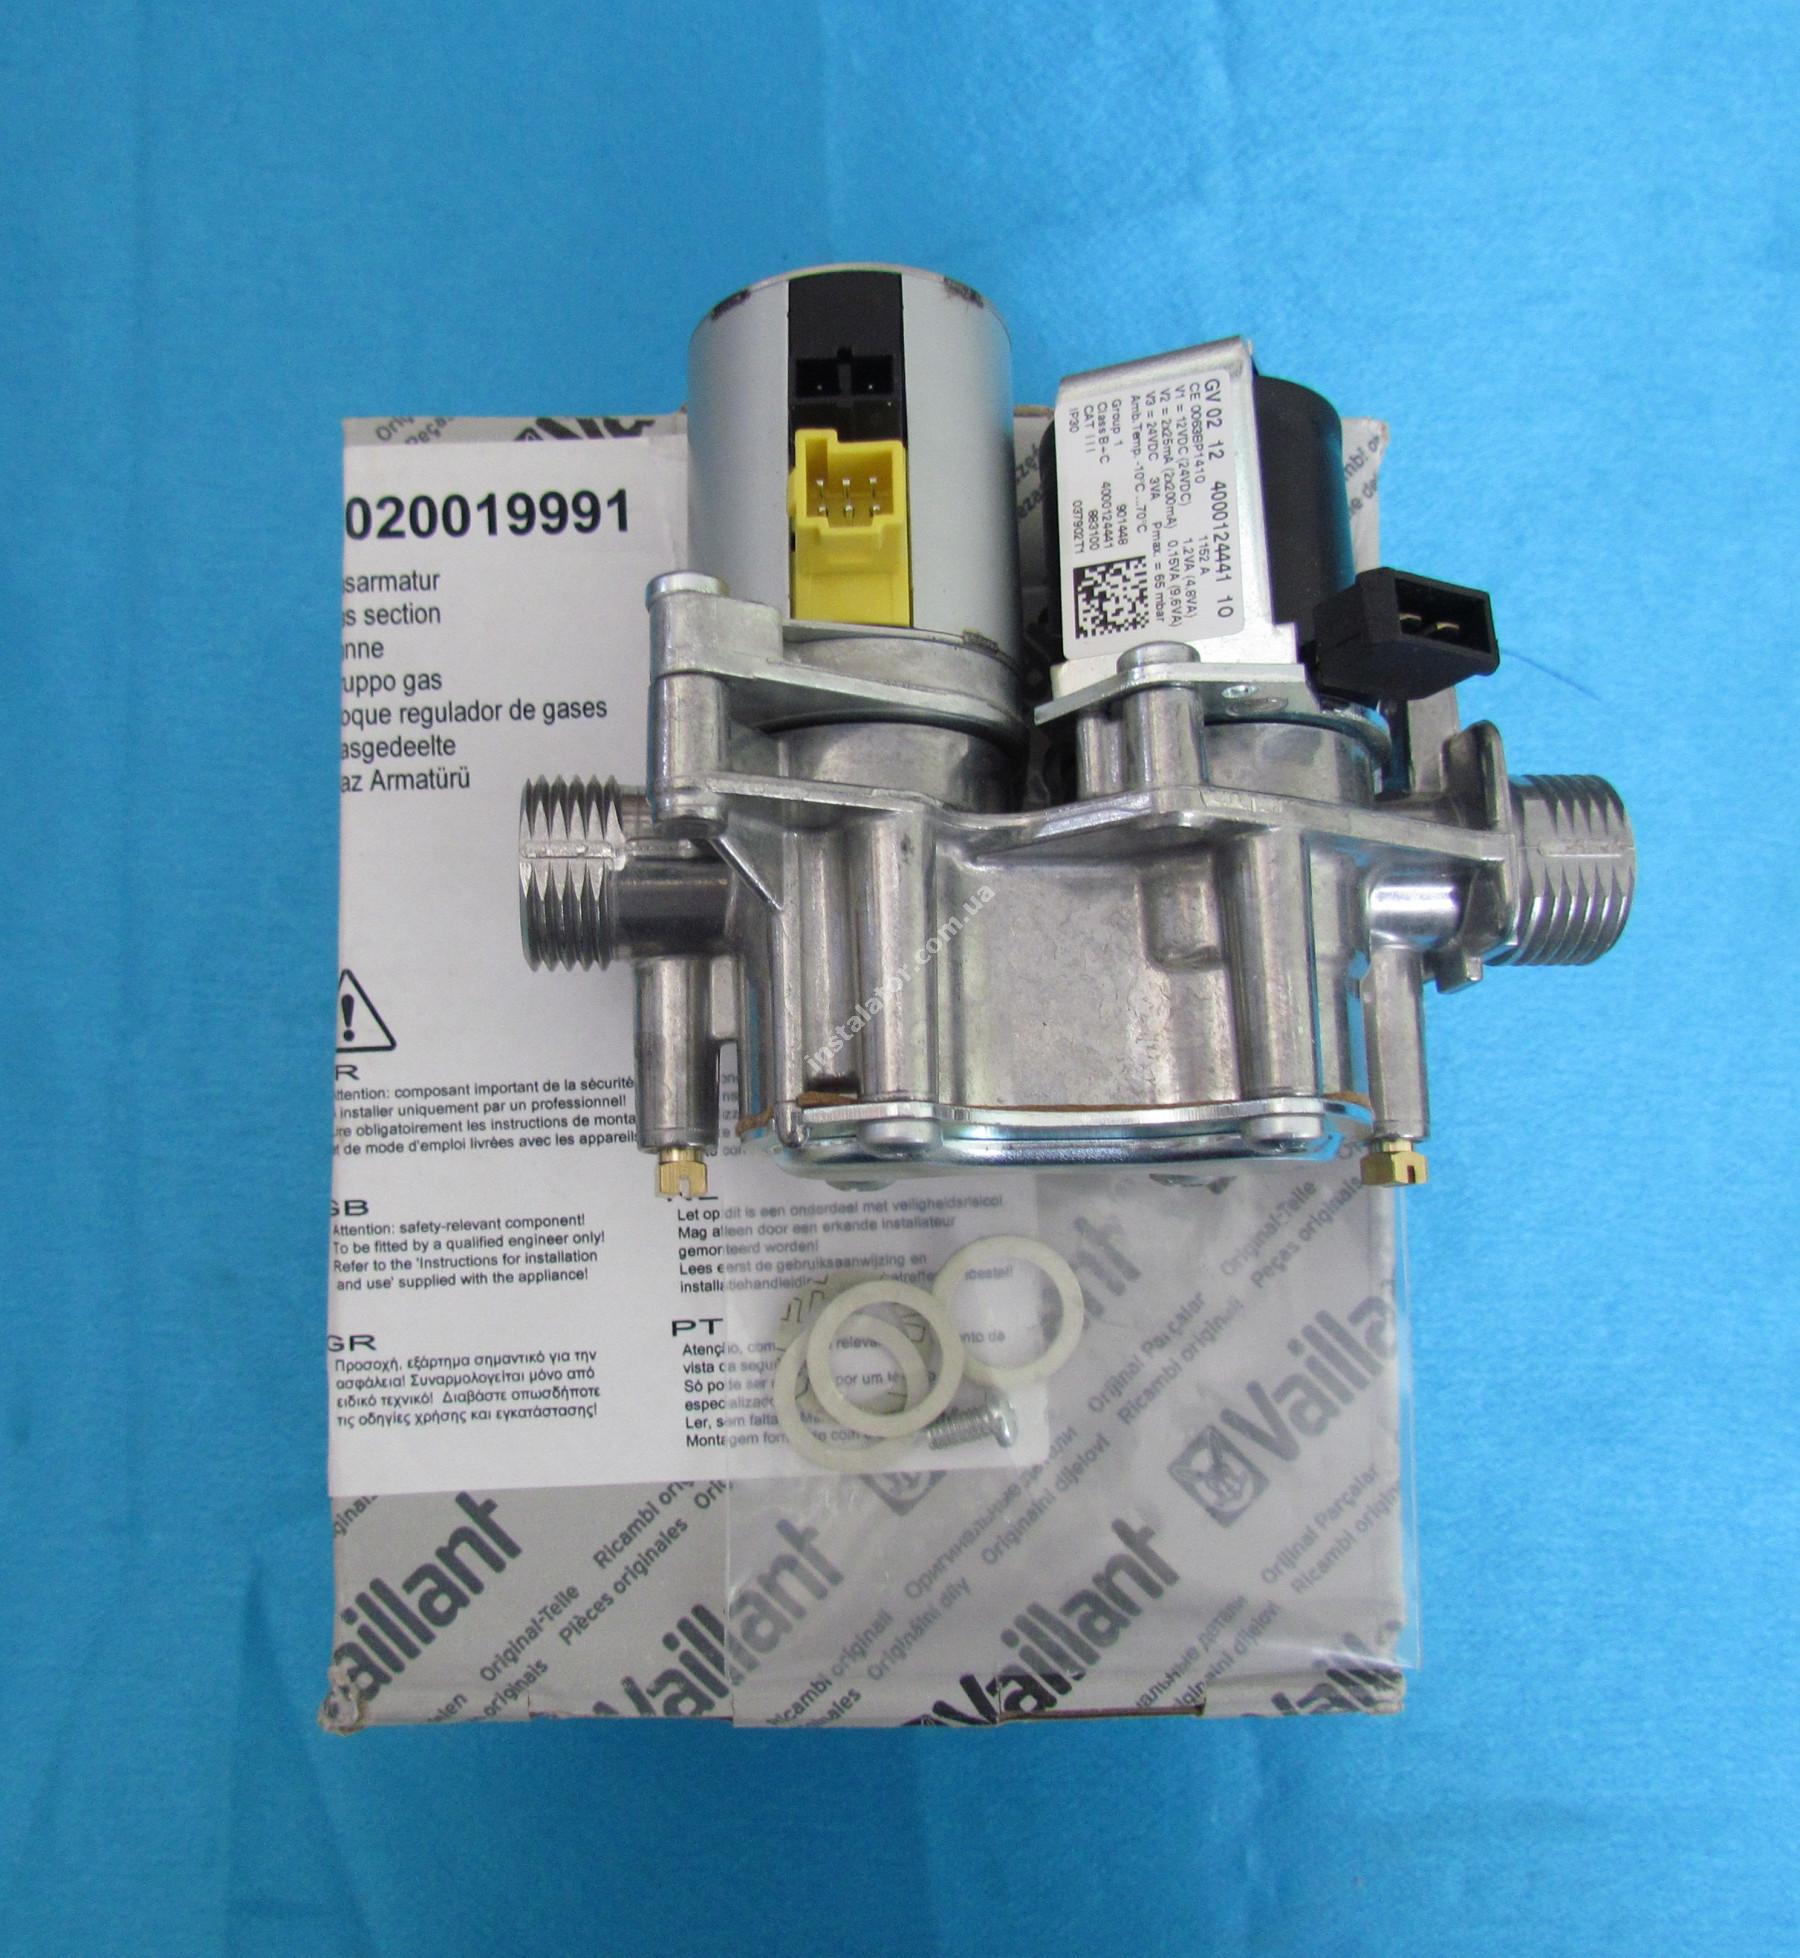 0020019991 Газовий клапан VAILLANT atmoTEC Pro / turboTEC Pro full-image-3